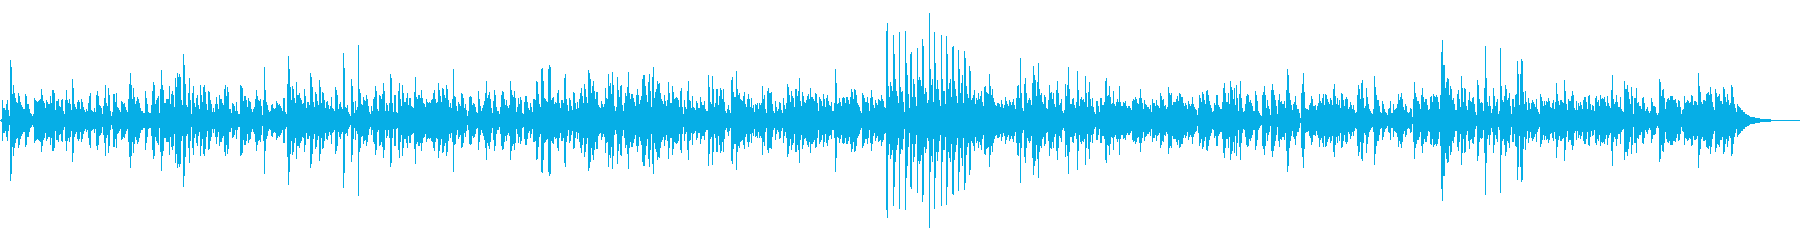 JAZZ|爽やかなリラックスカフェBGMの再生済みの波形